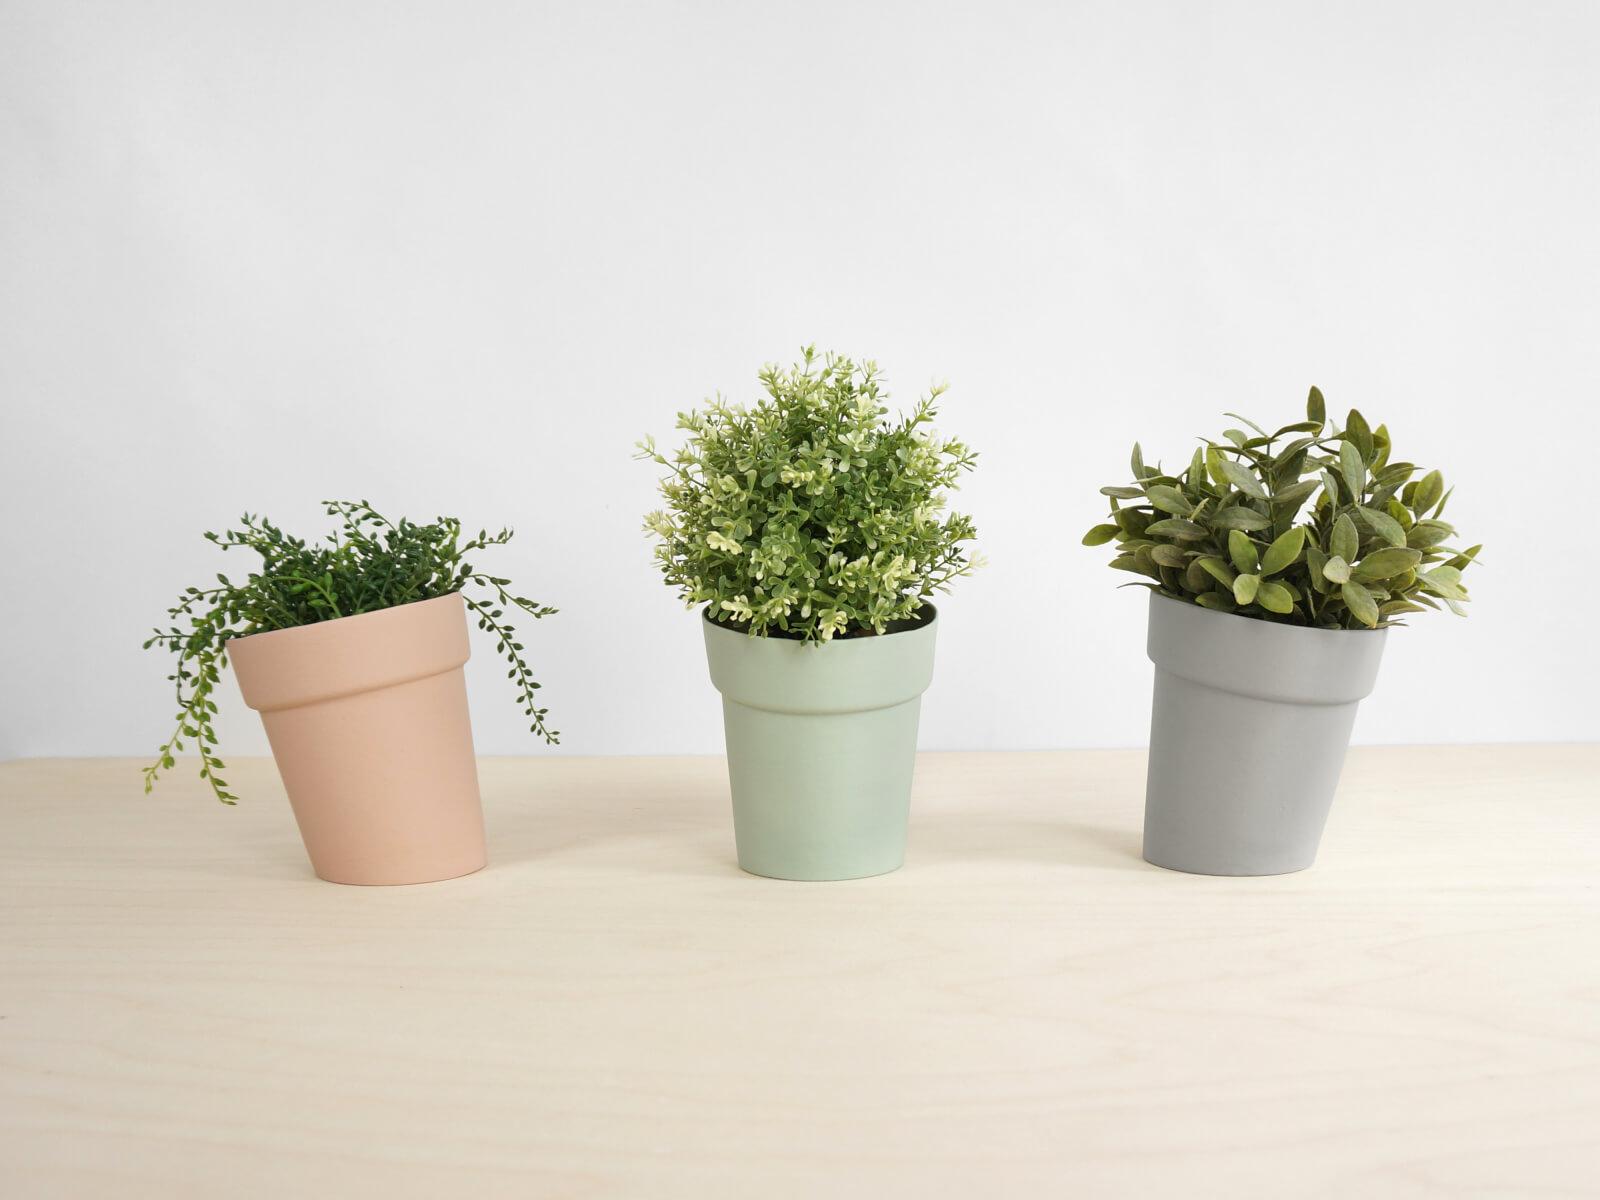 studio lorier distort flowerpot small. Black Bedroom Furniture Sets. Home Design Ideas